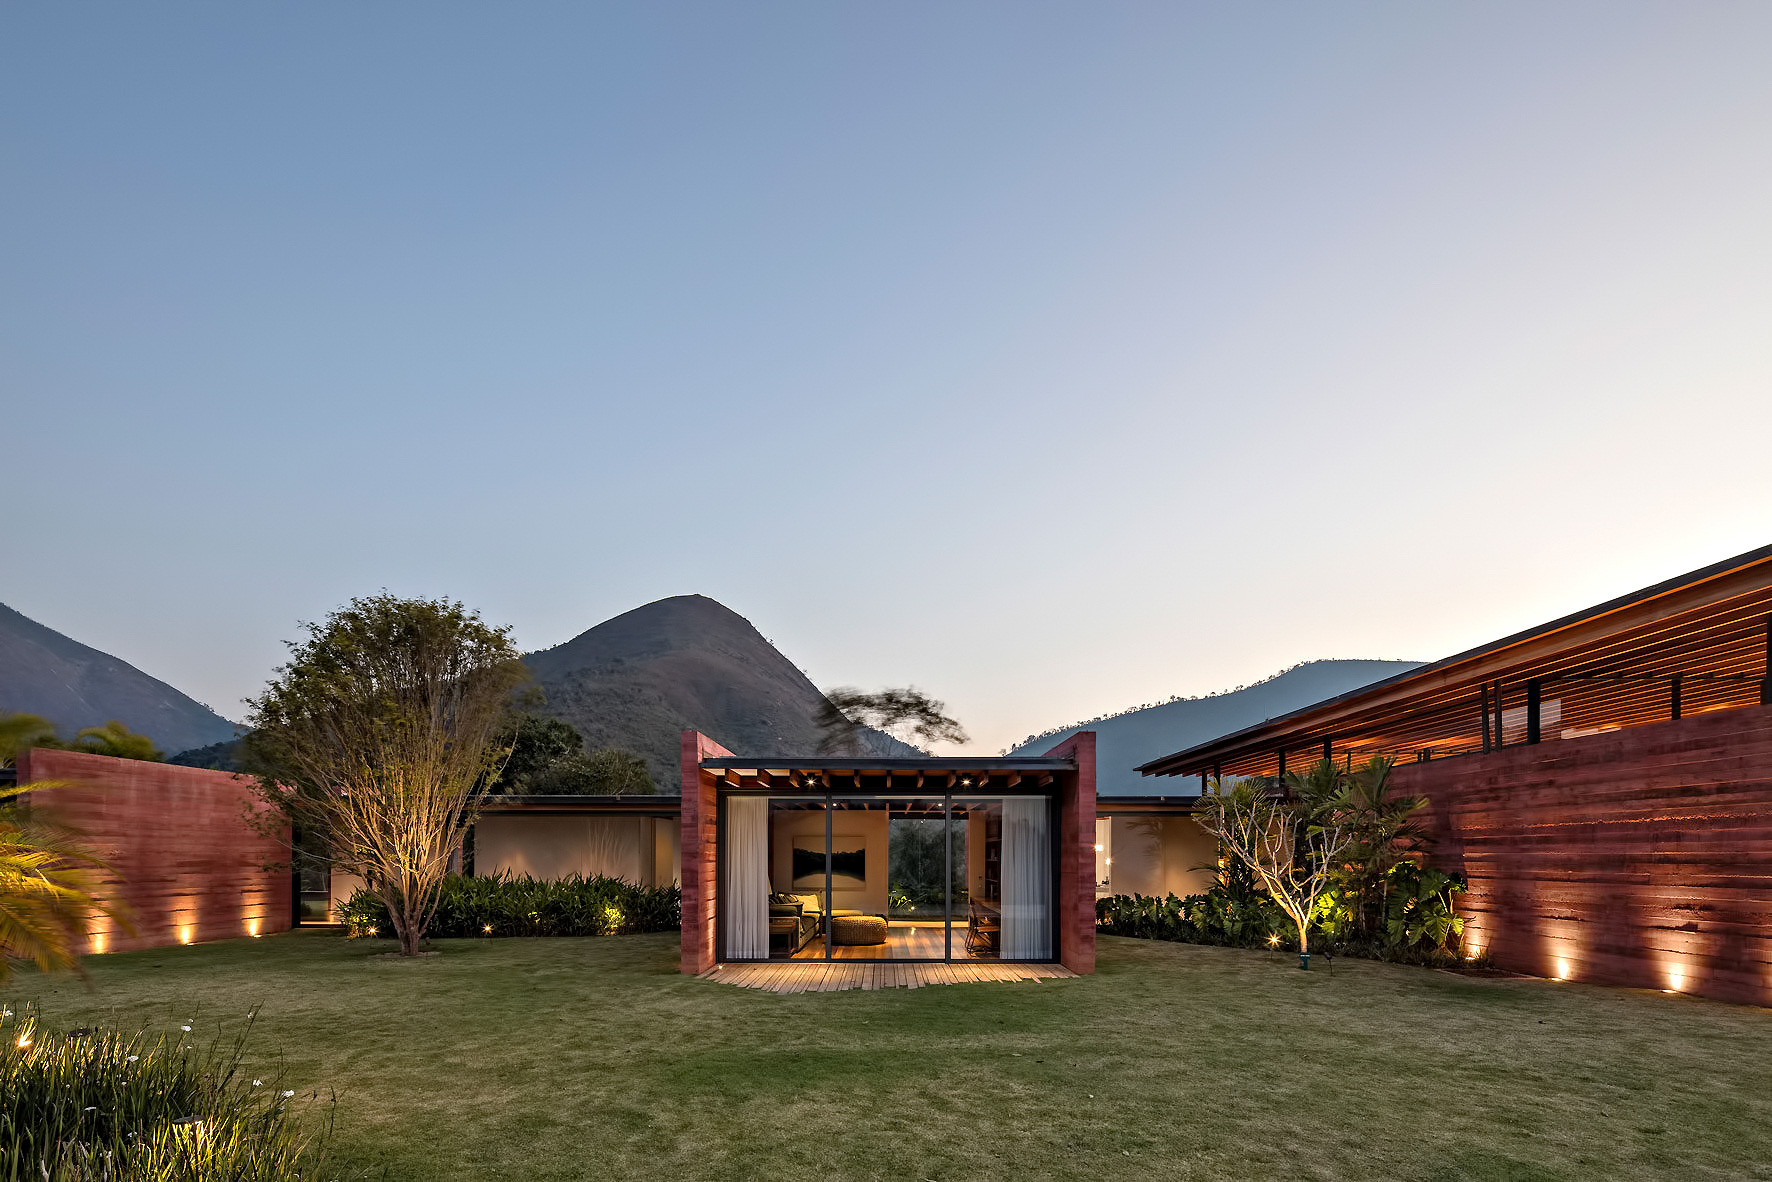 Casa Terra Residence - Itaipava, Petrópolis, Rio de Janeiro, Brazil